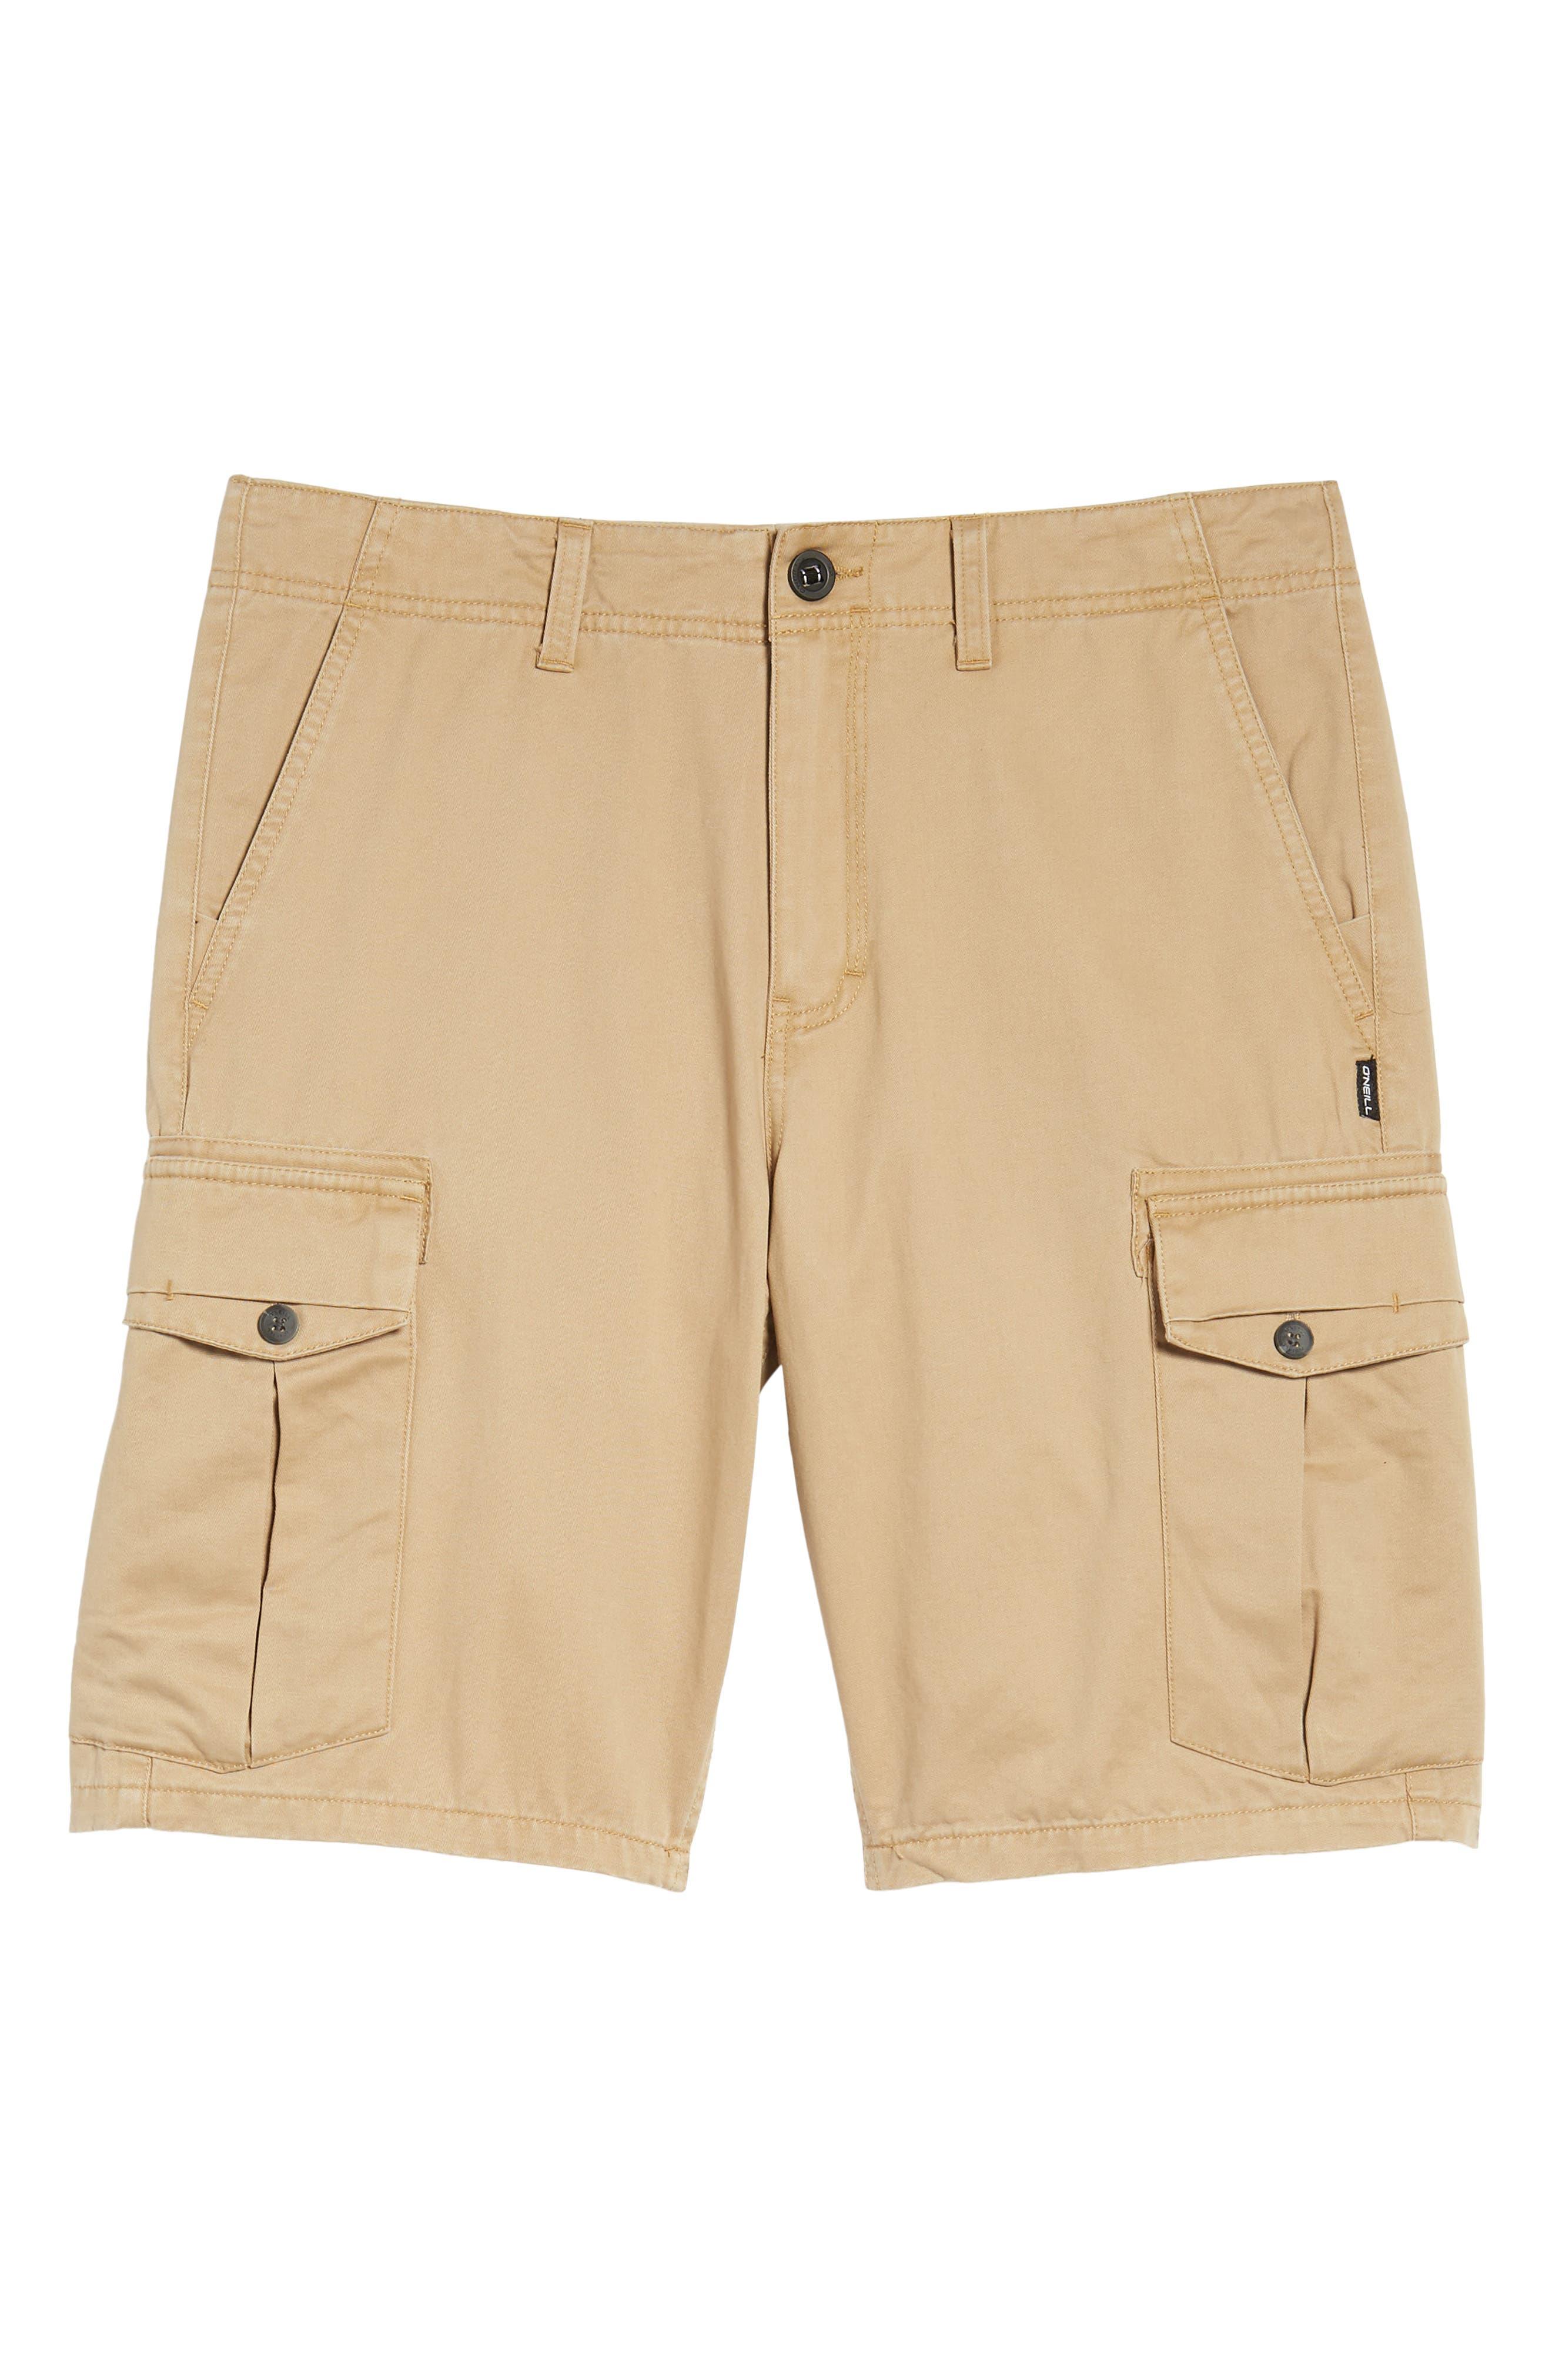 Campbell Cargo Shorts,                             Alternate thumbnail 6, color,                             Khaki